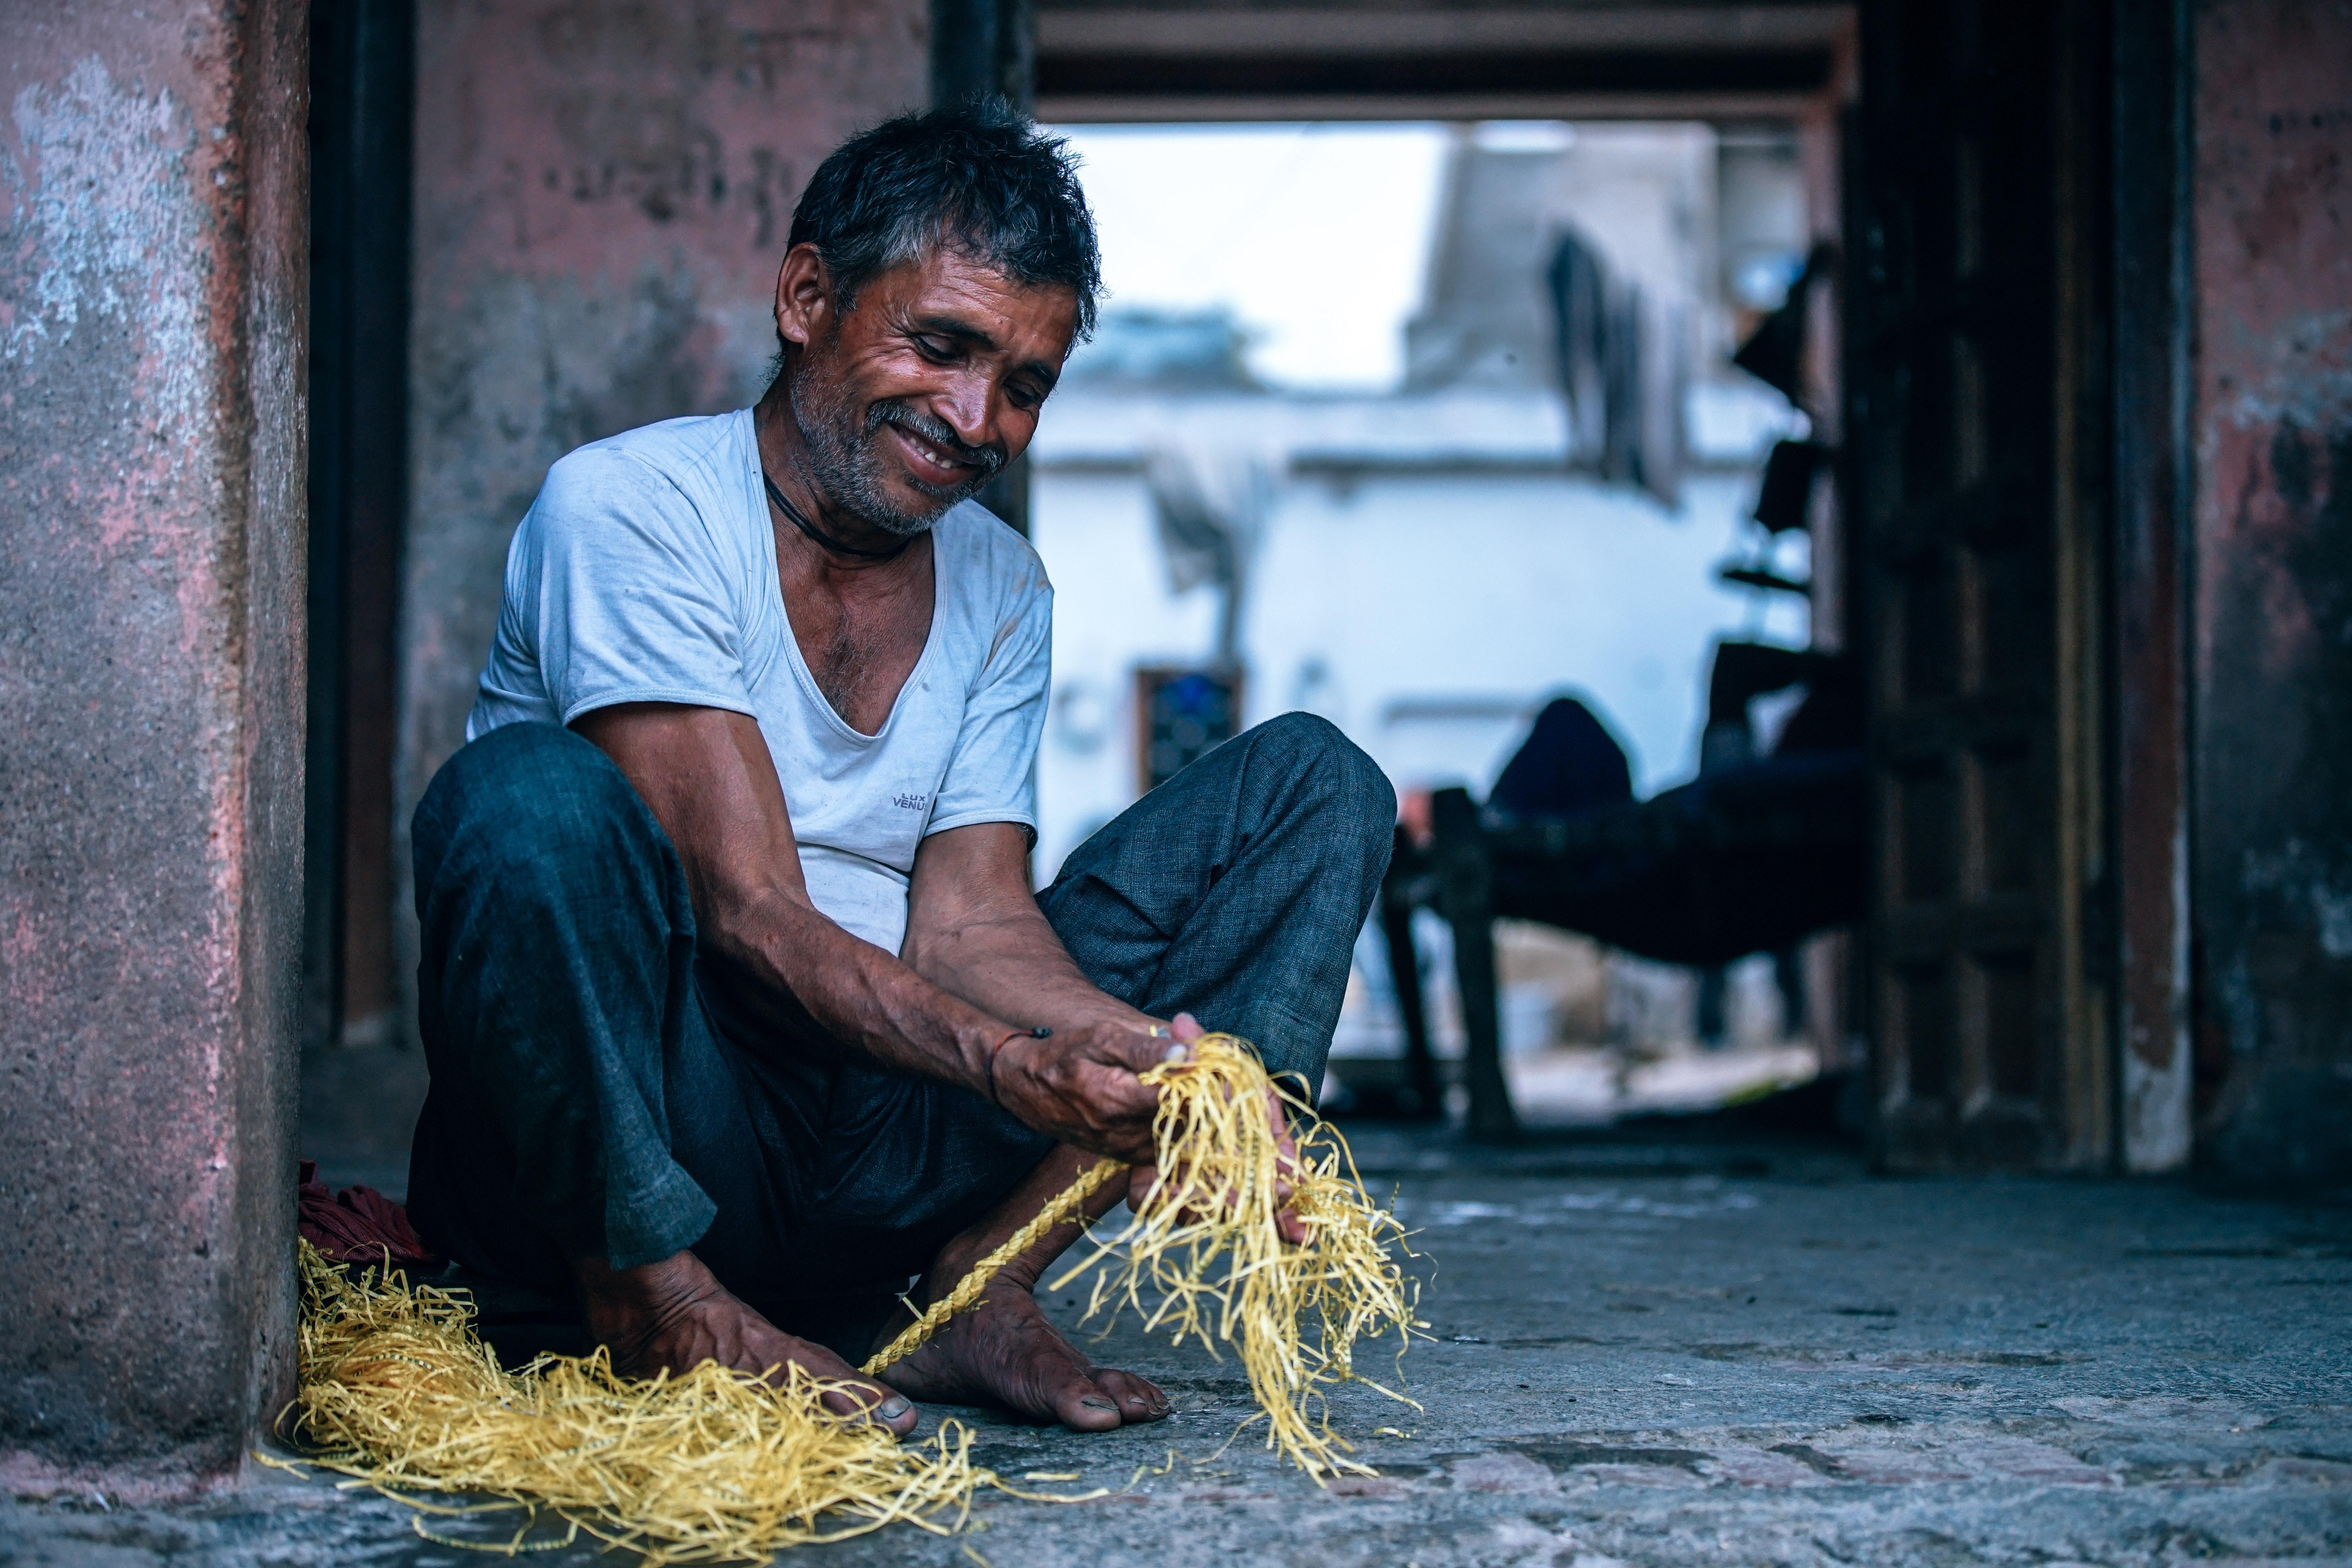 Man Holding Yellow String, Senior, Working, Wicker, Weaving, HQ Photo